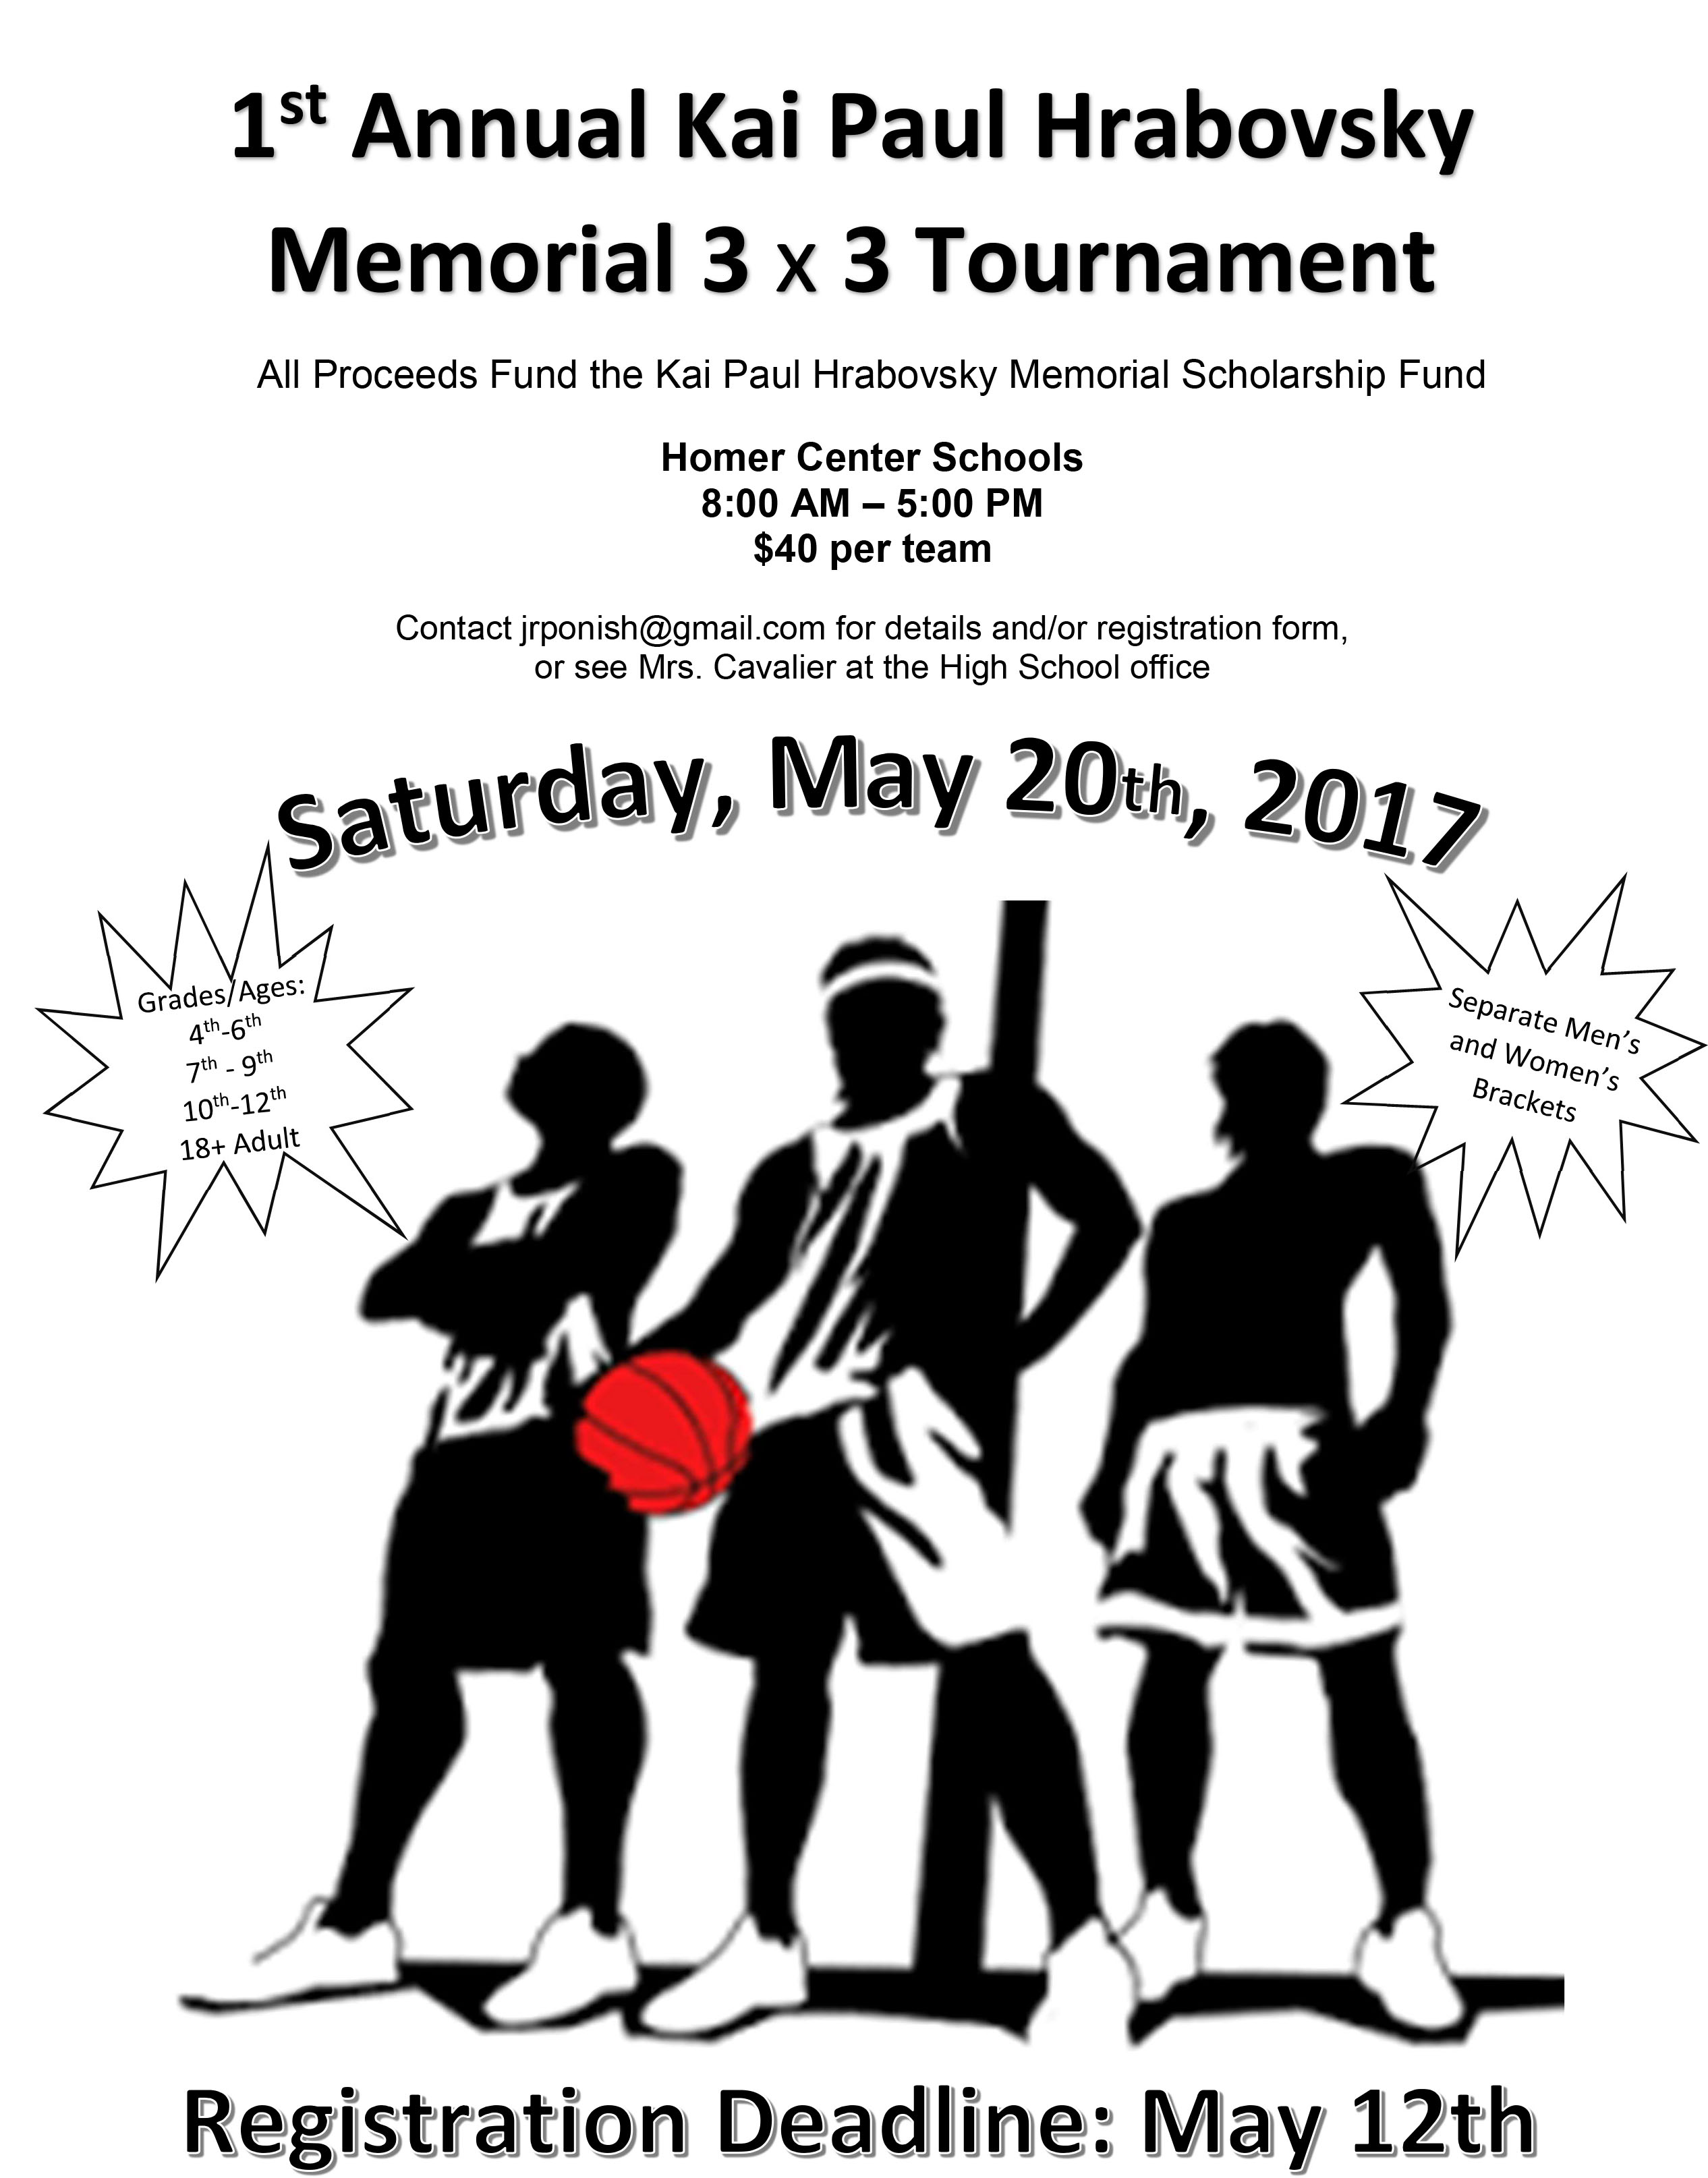 Kai Paul Hrabovsky Memorial 3 on 3 Tournament